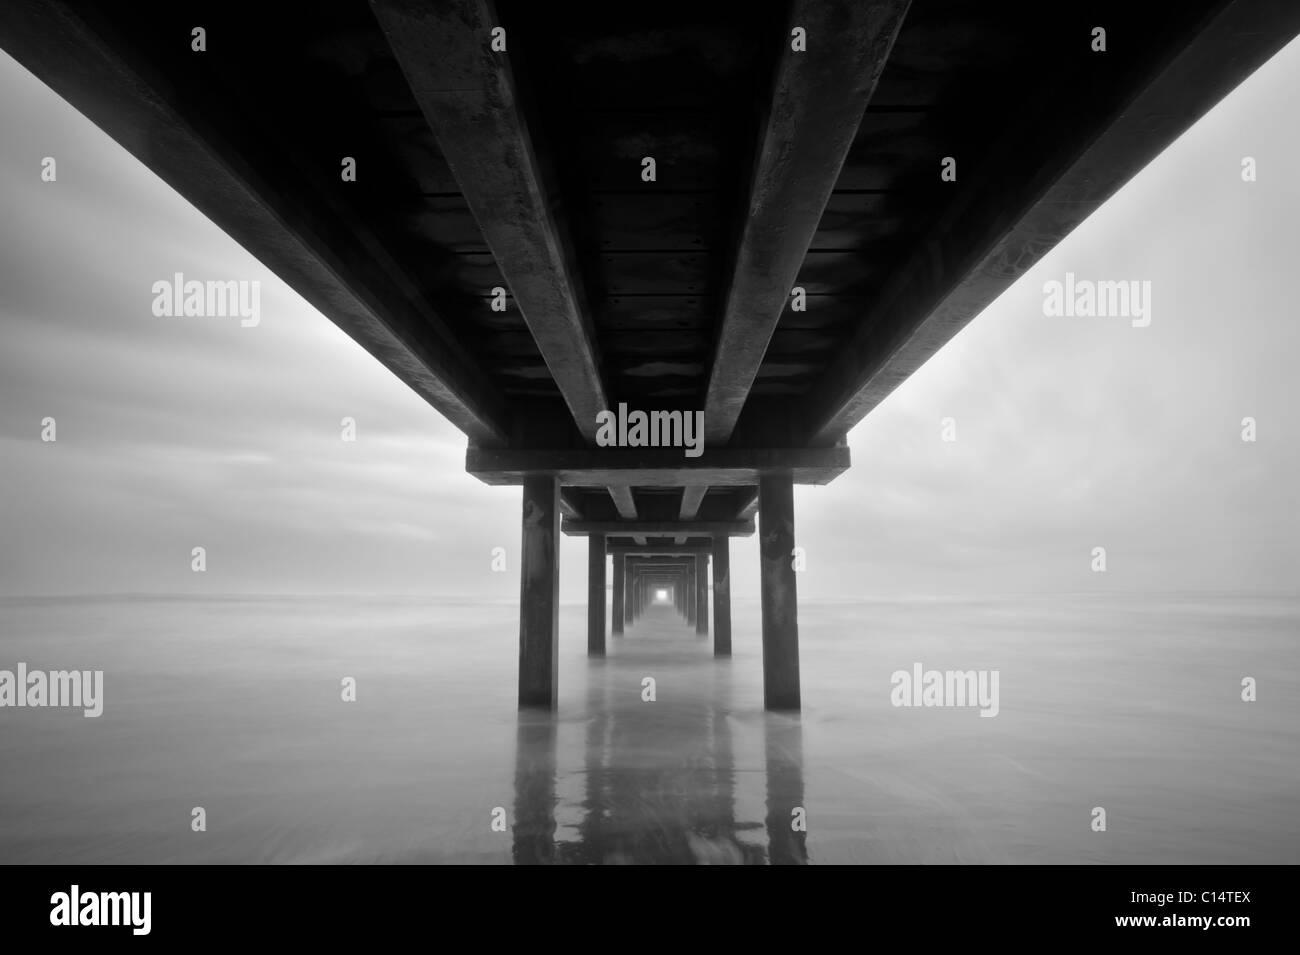 Photo taken under a pier in Port Aransas, Texas. - Stock Image